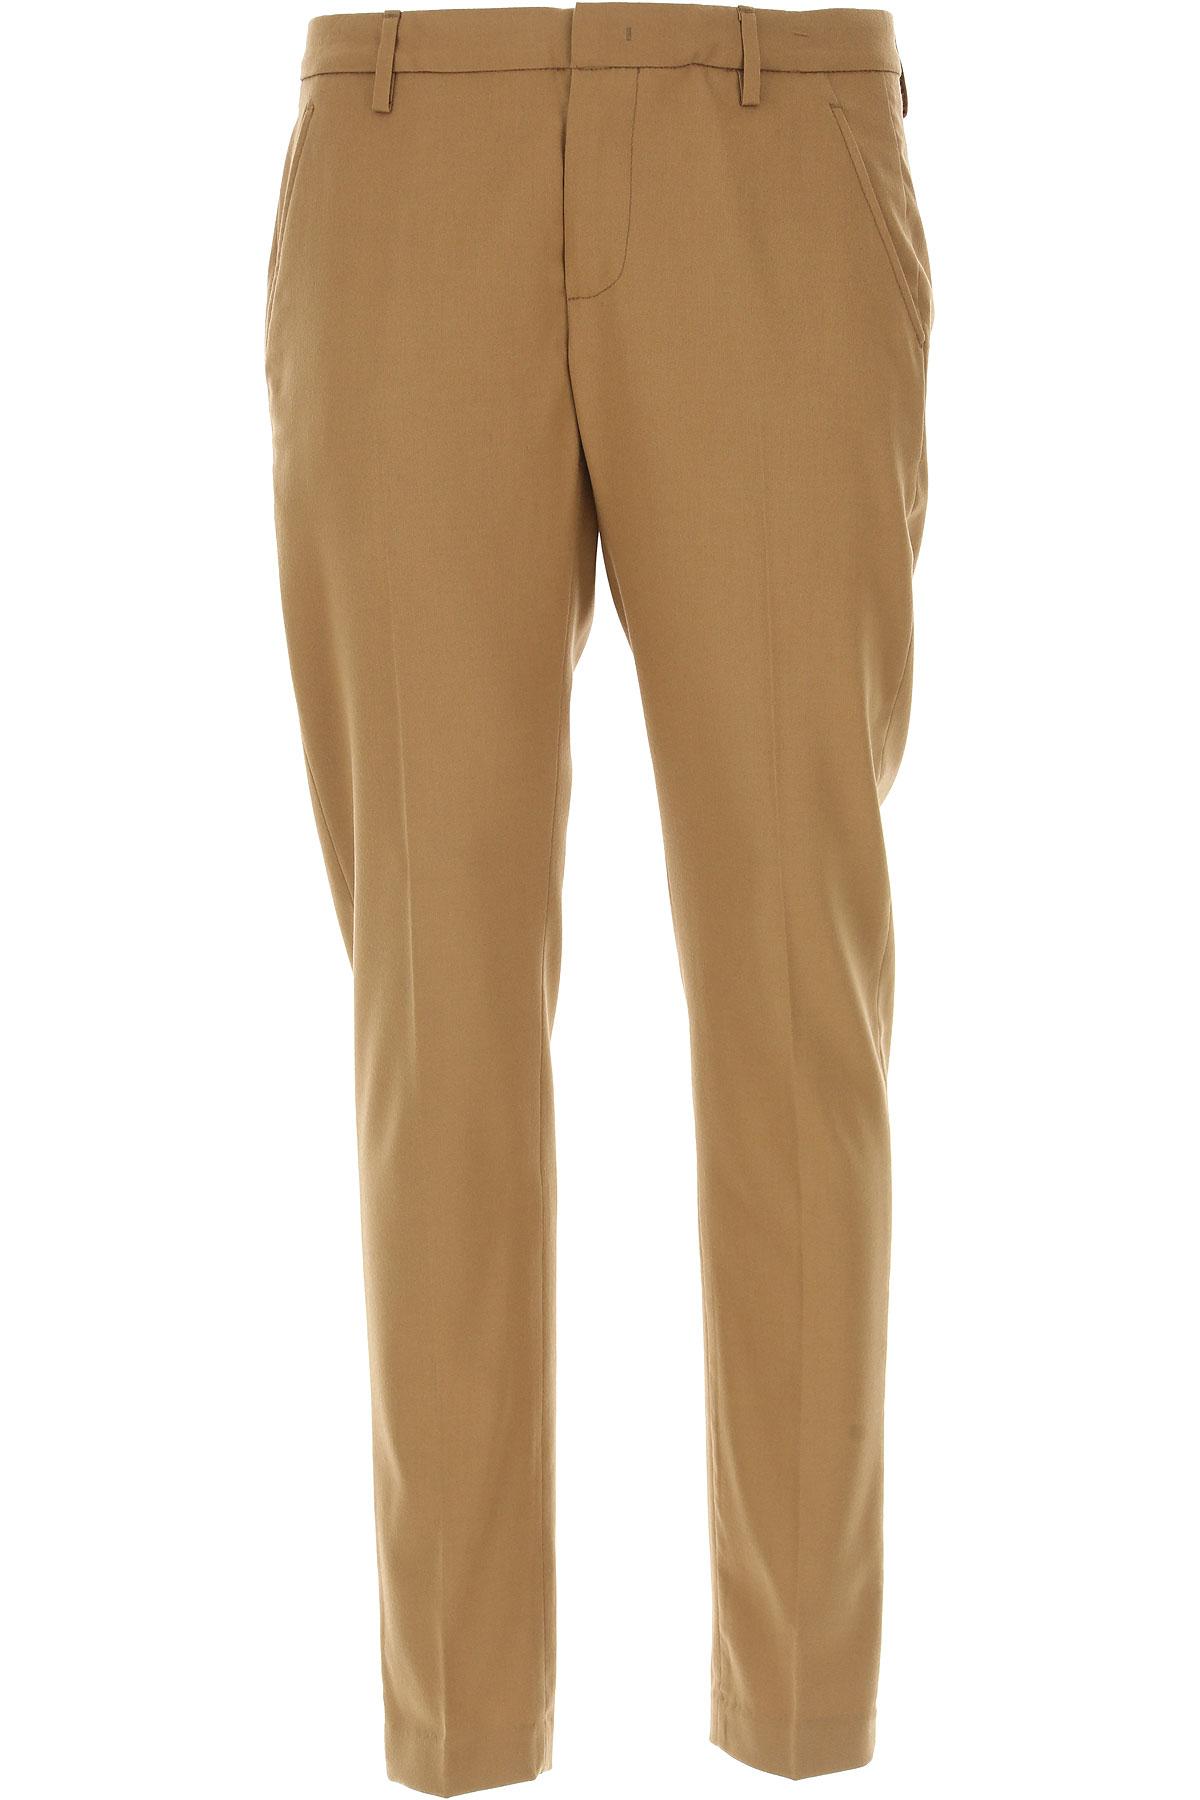 Dondup Pants for Men On Sale, Camel, Wool, 2017, 30 32 33 34 36